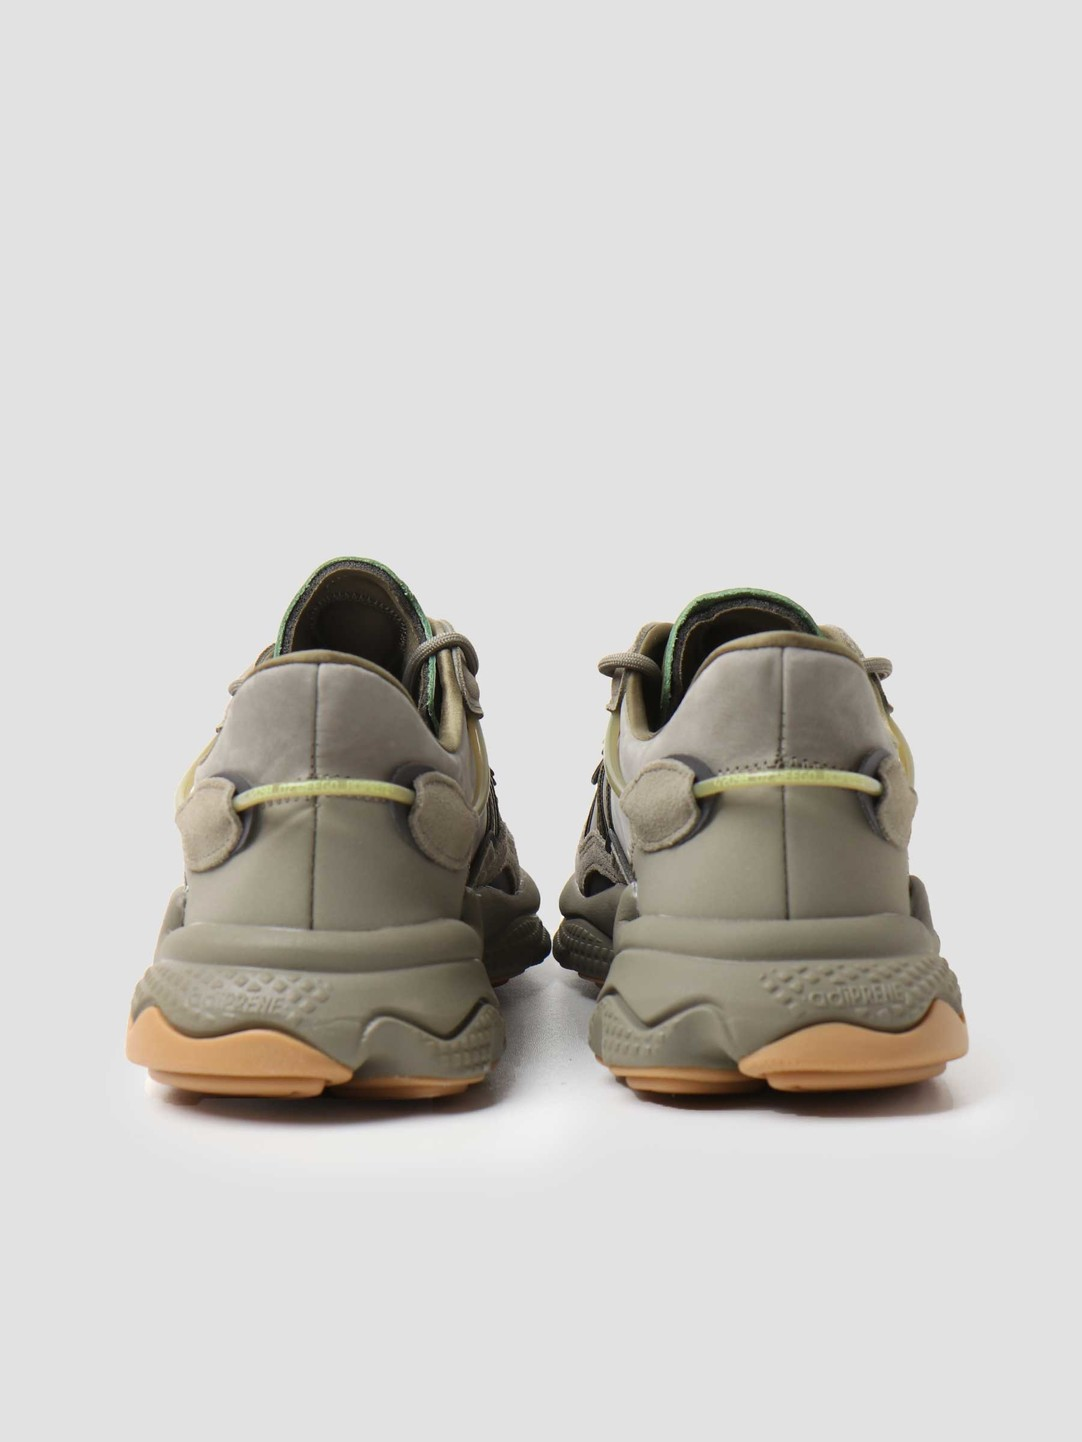 adidas adidas Ozweego Trace Cargo Night Cargo Raw Khaki EE6461